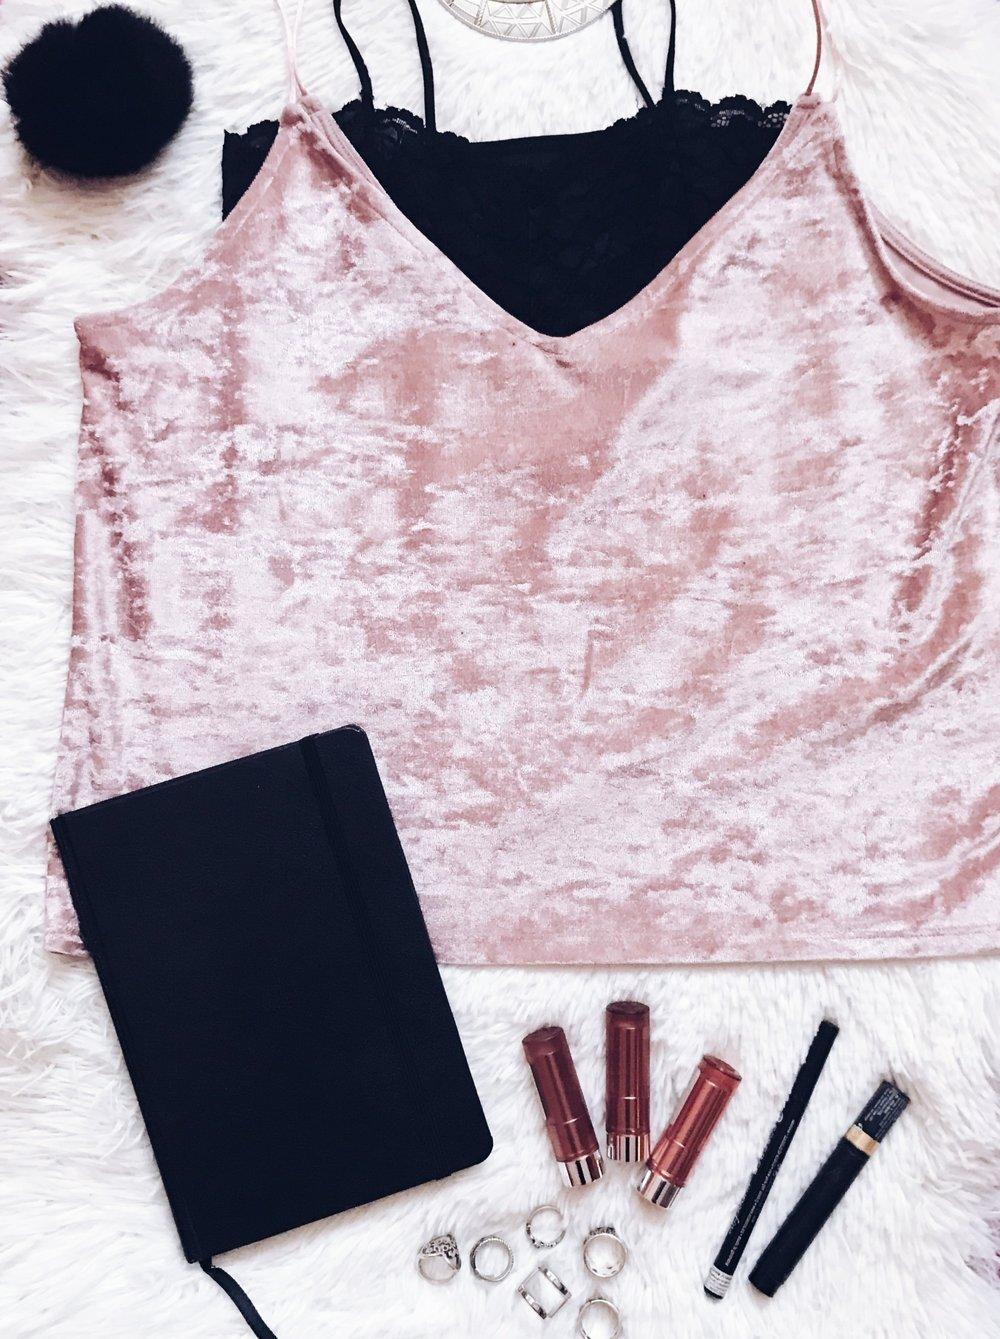 Top: H&M  Black Lace Bralette: ASOS  Lipsticks: Essence  Eyeliners: Essence, L'Oréal  Rings: H&M, Forever 21  Notebook: Moleskine